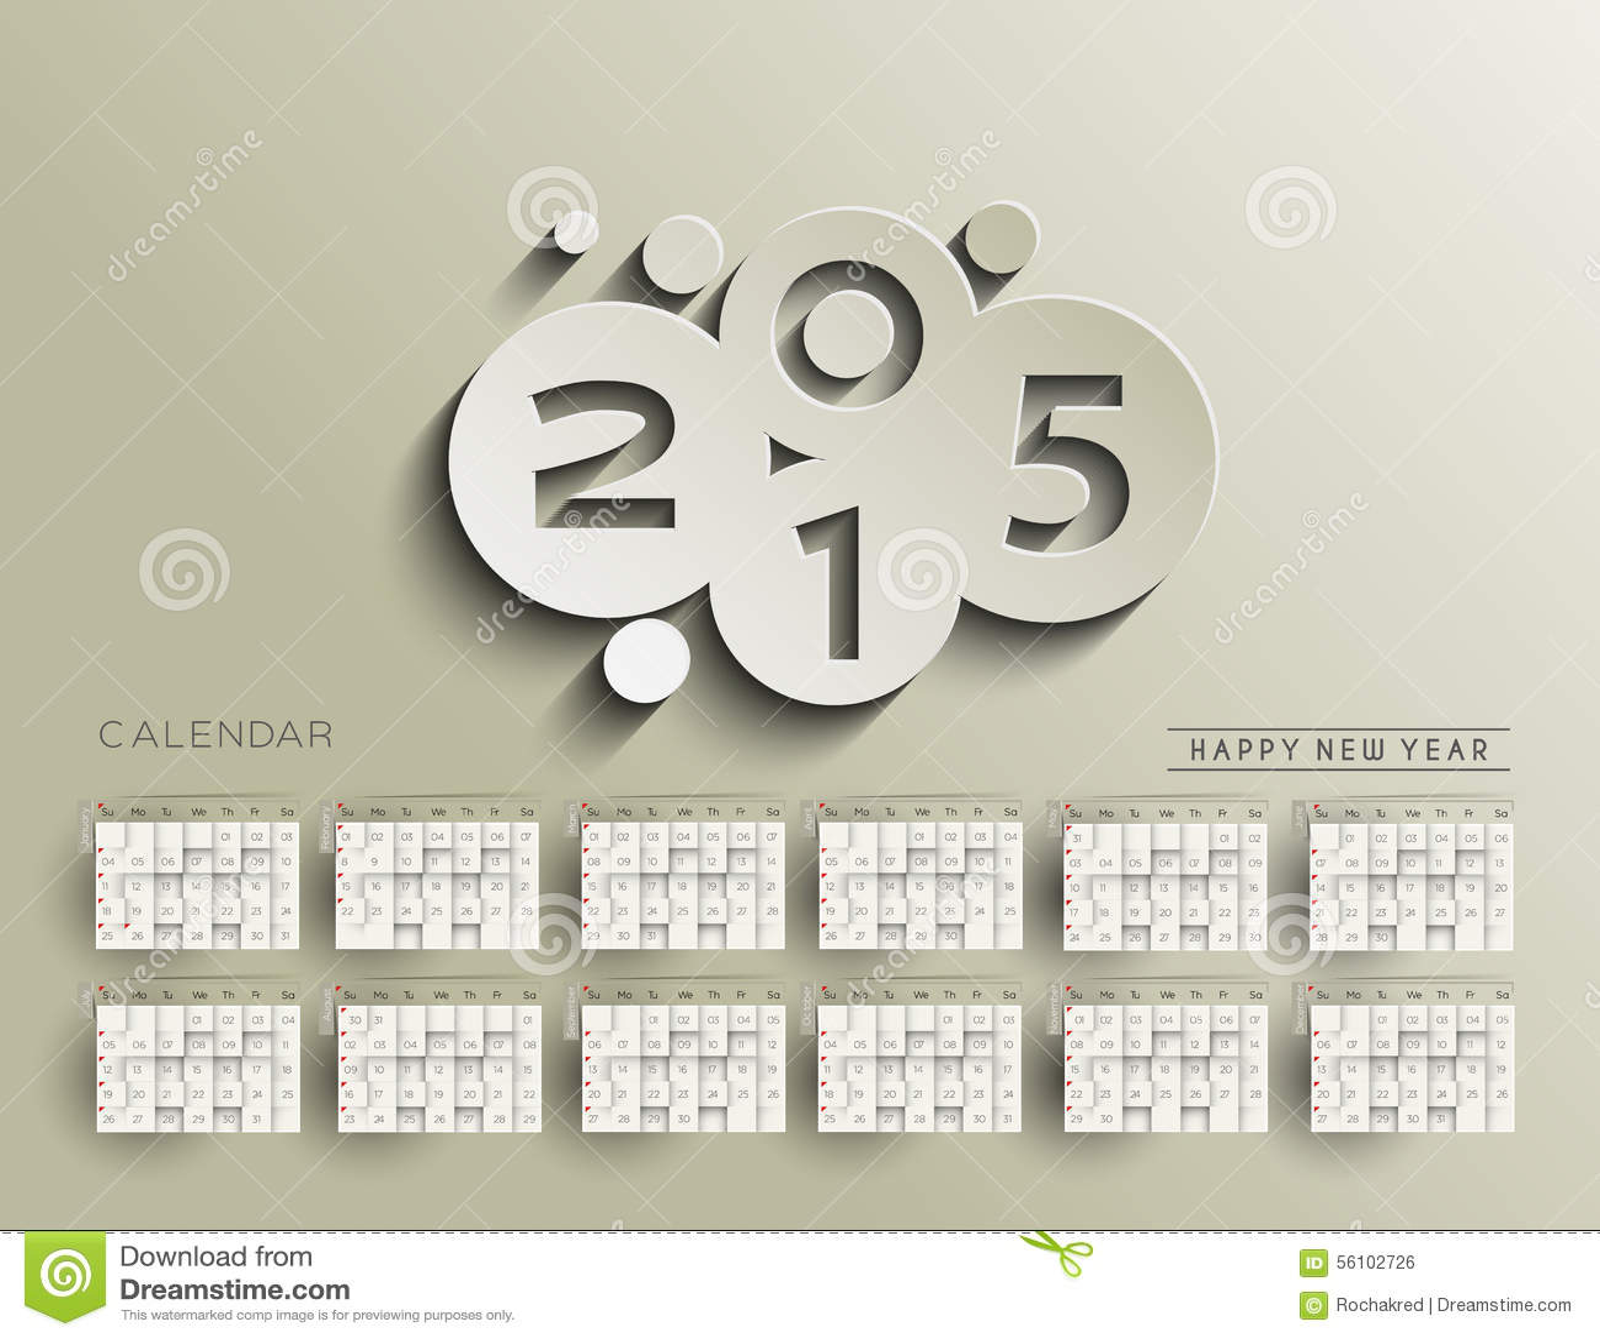 Creative New Year Calendar